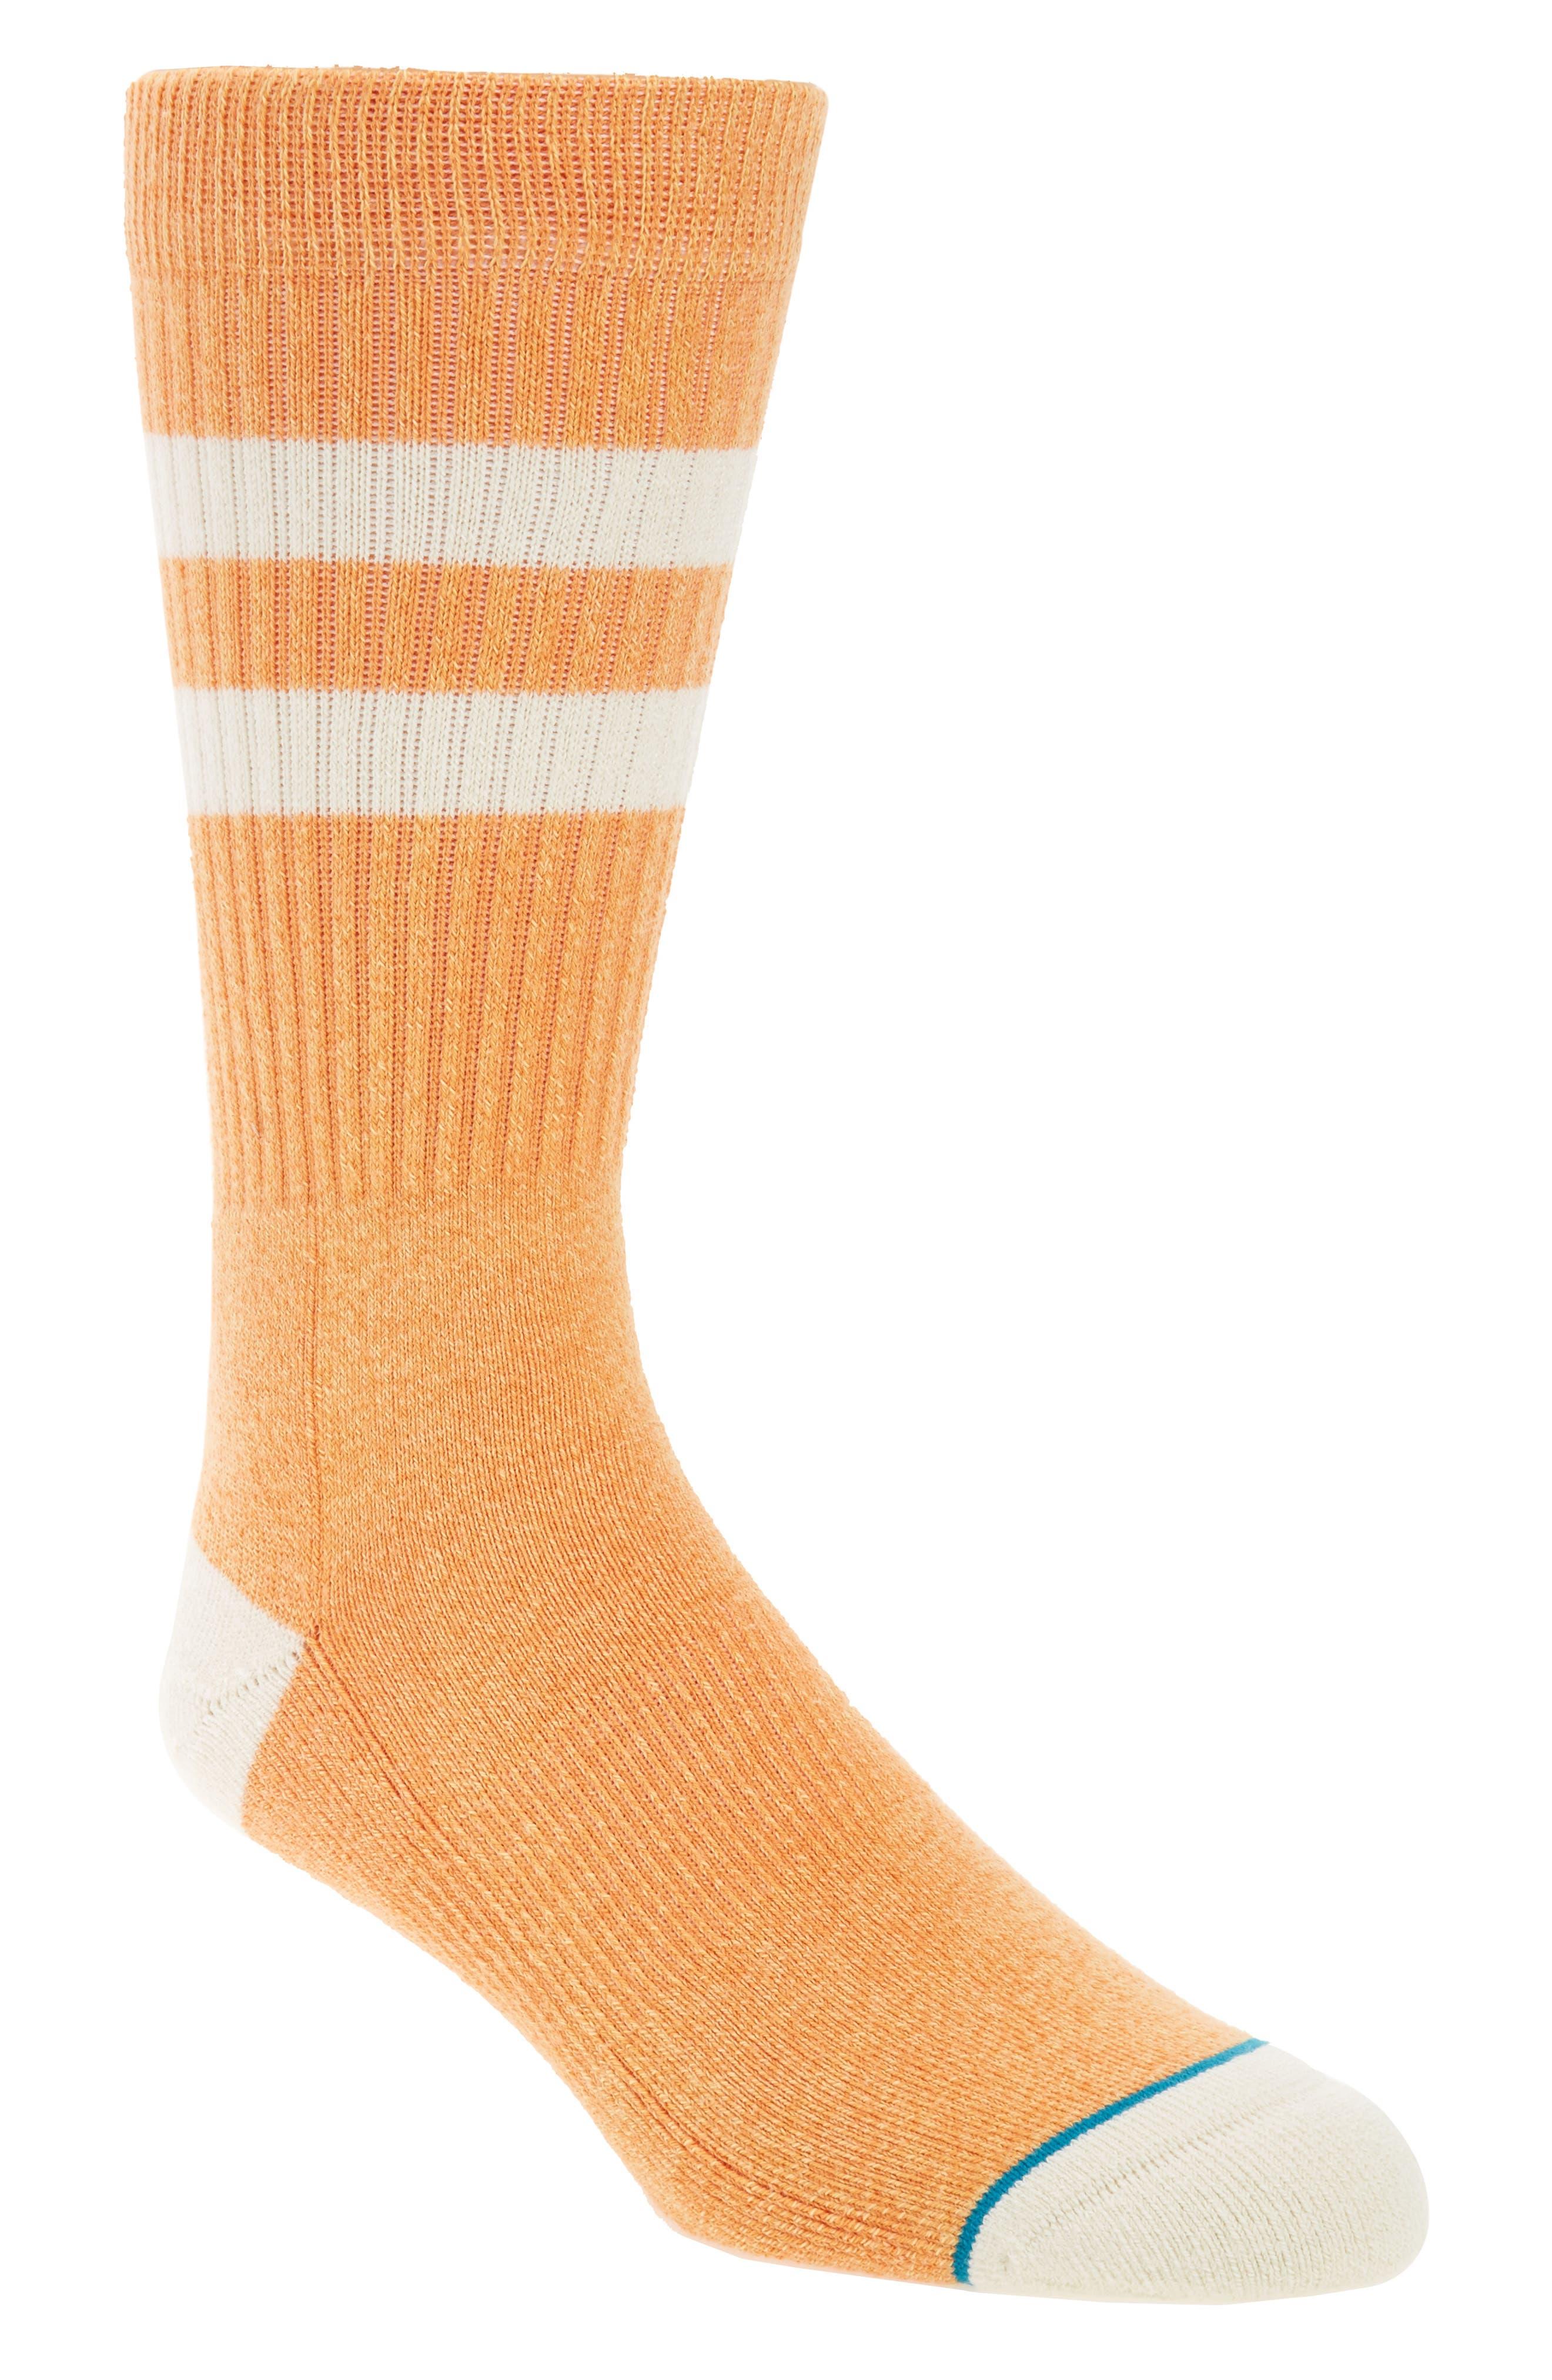 Salty Crew Socks,                             Main thumbnail 1, color,                             810